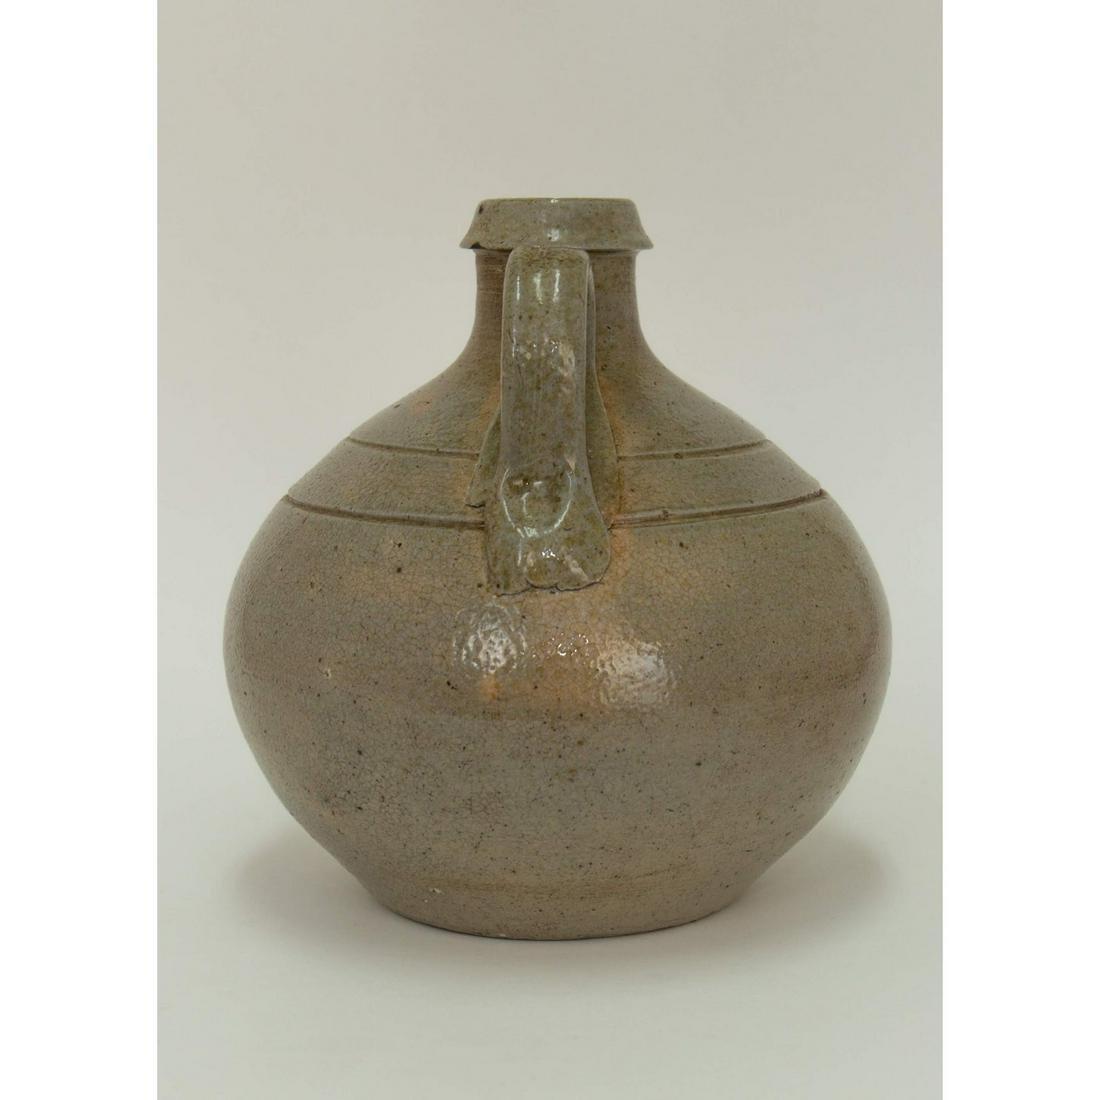 Pint Sized Jugtown NC Salt Glaze Stoneware Jug